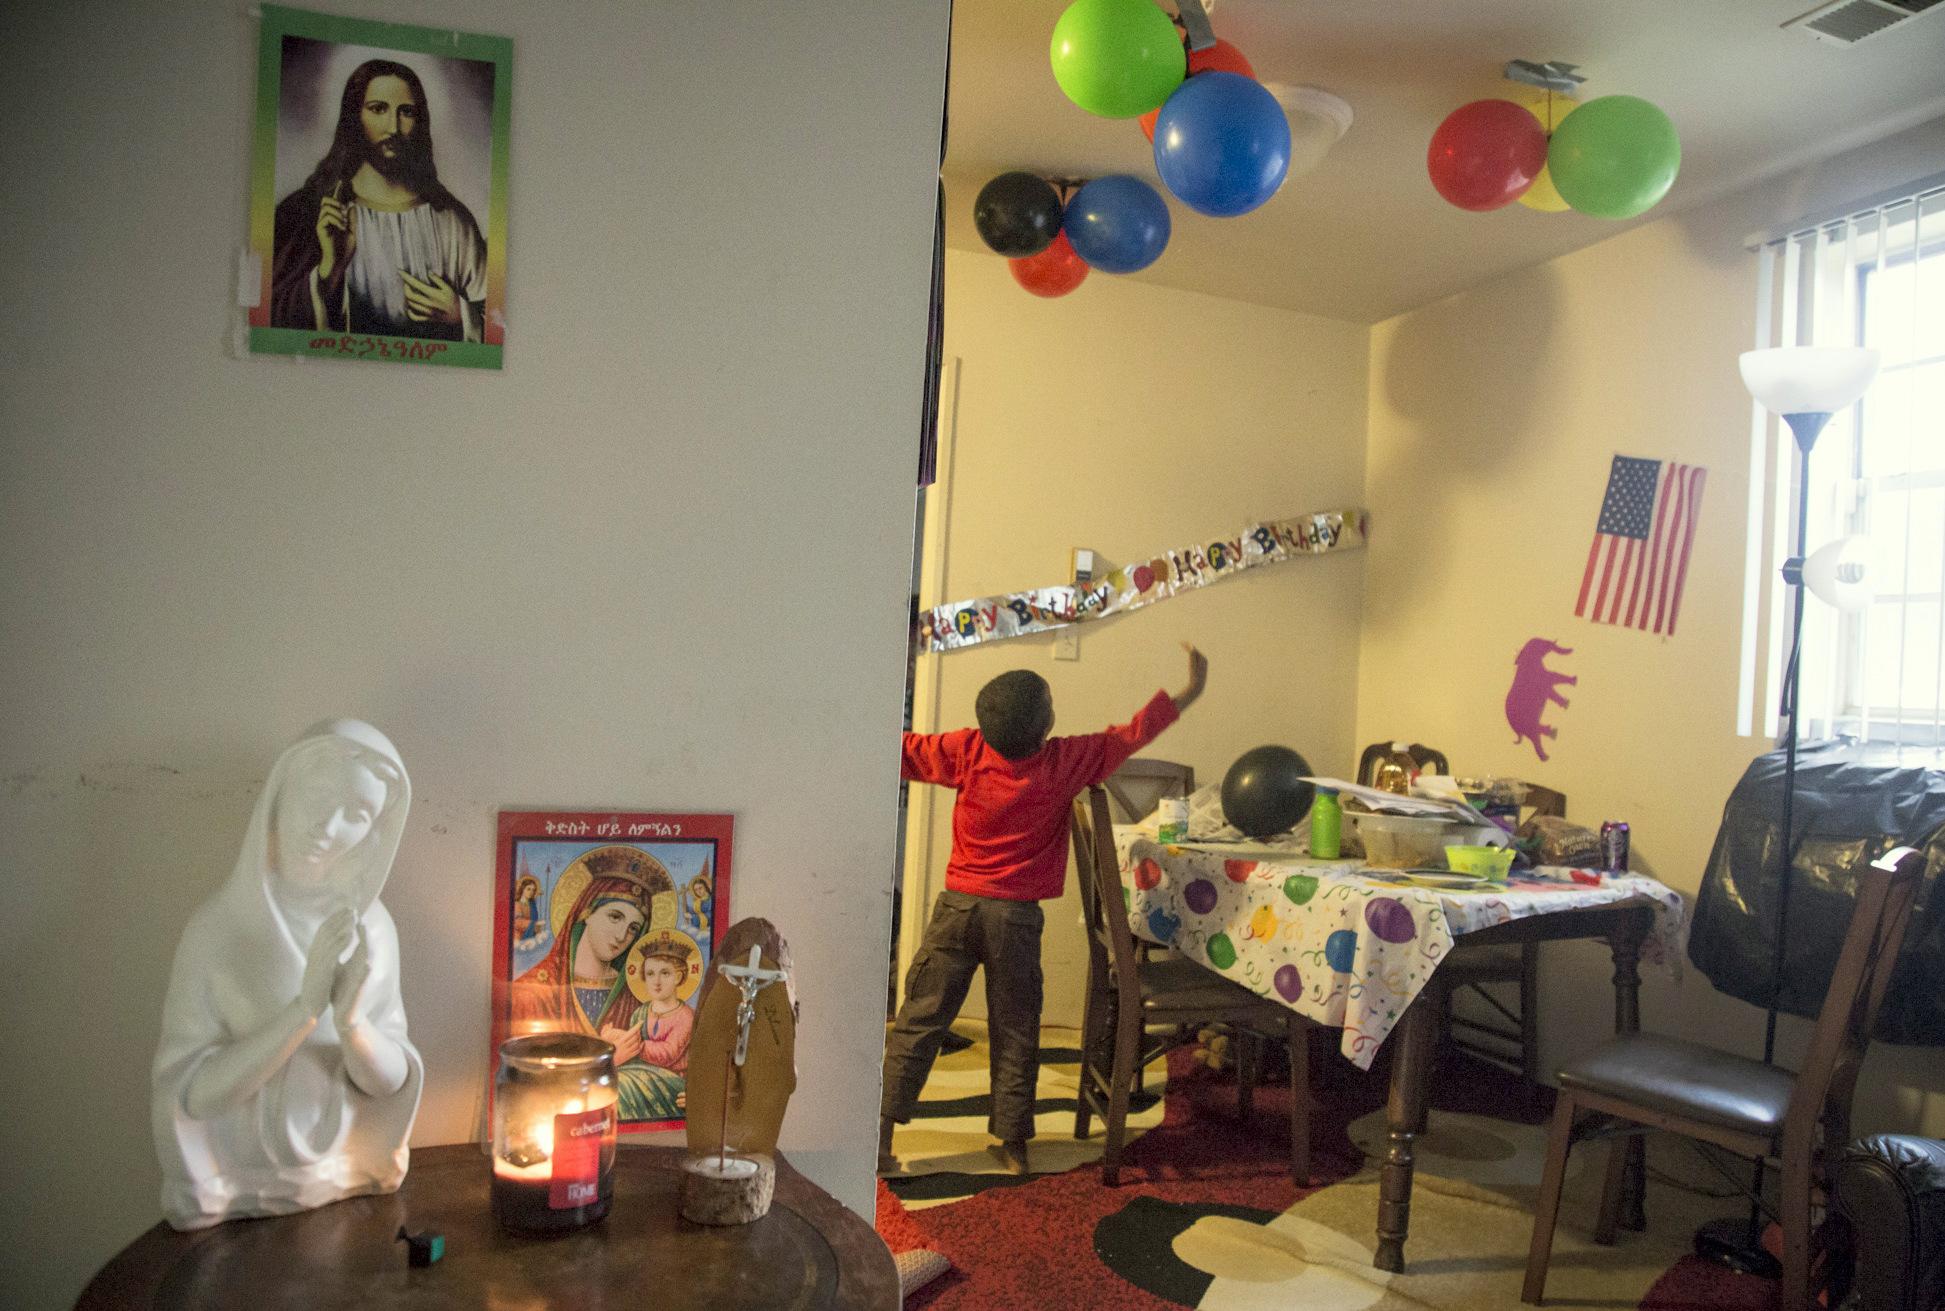 Zaid Degol, like roughly half the population of Eritrea, is Christian. (Jennifer Bishop)